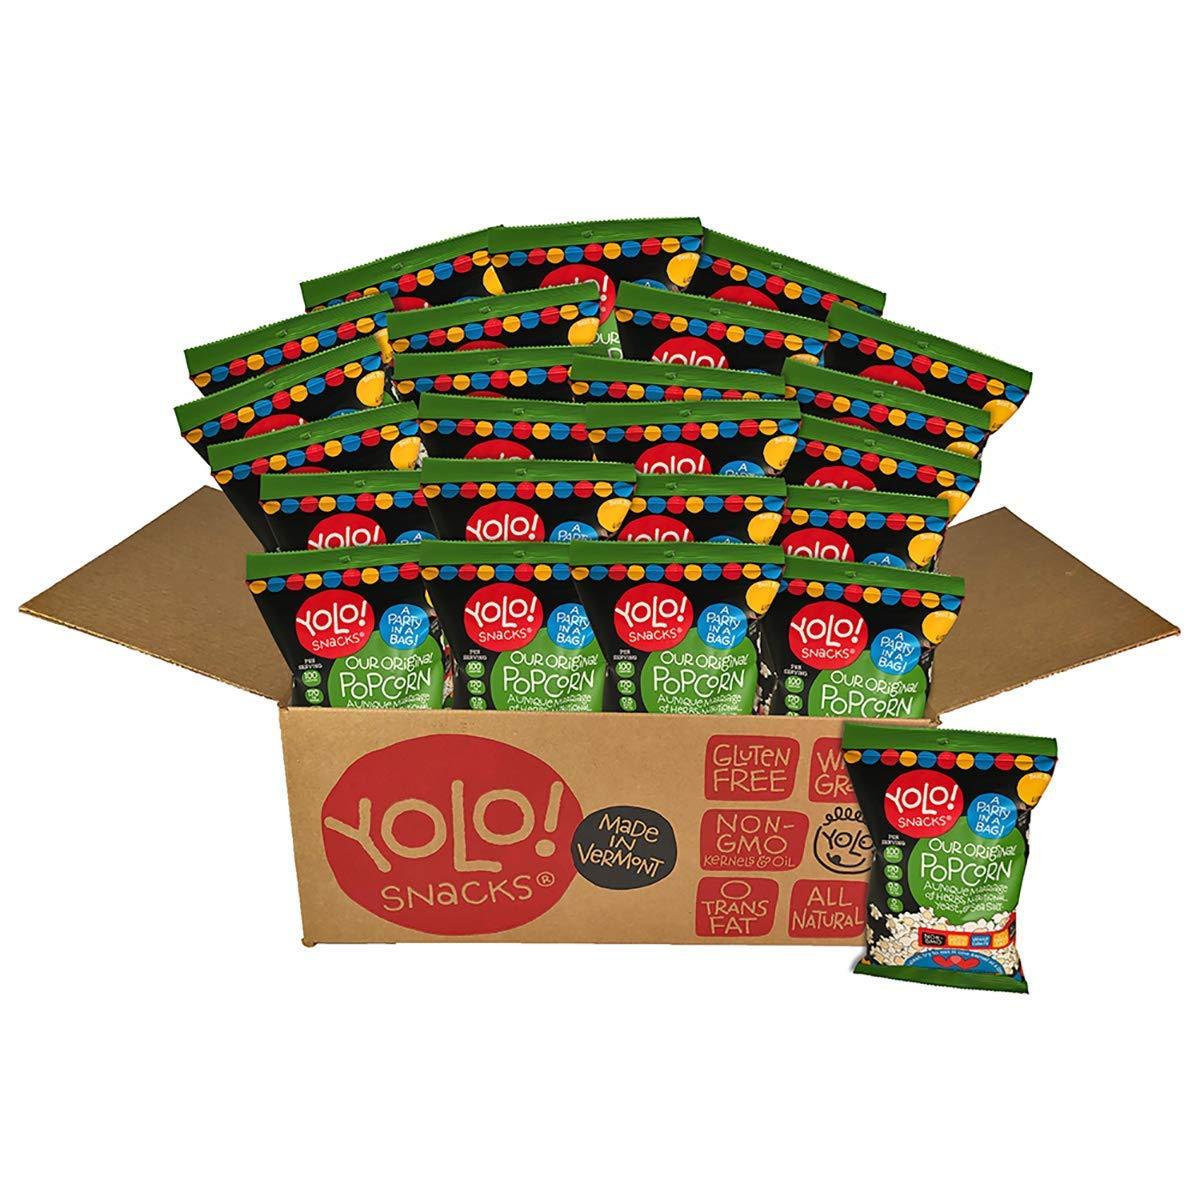 YOLO! Snacks – Gourmet Original Savory Flavor Individual Bag Popped Popcorn - 21 Grams - 24 Count Case